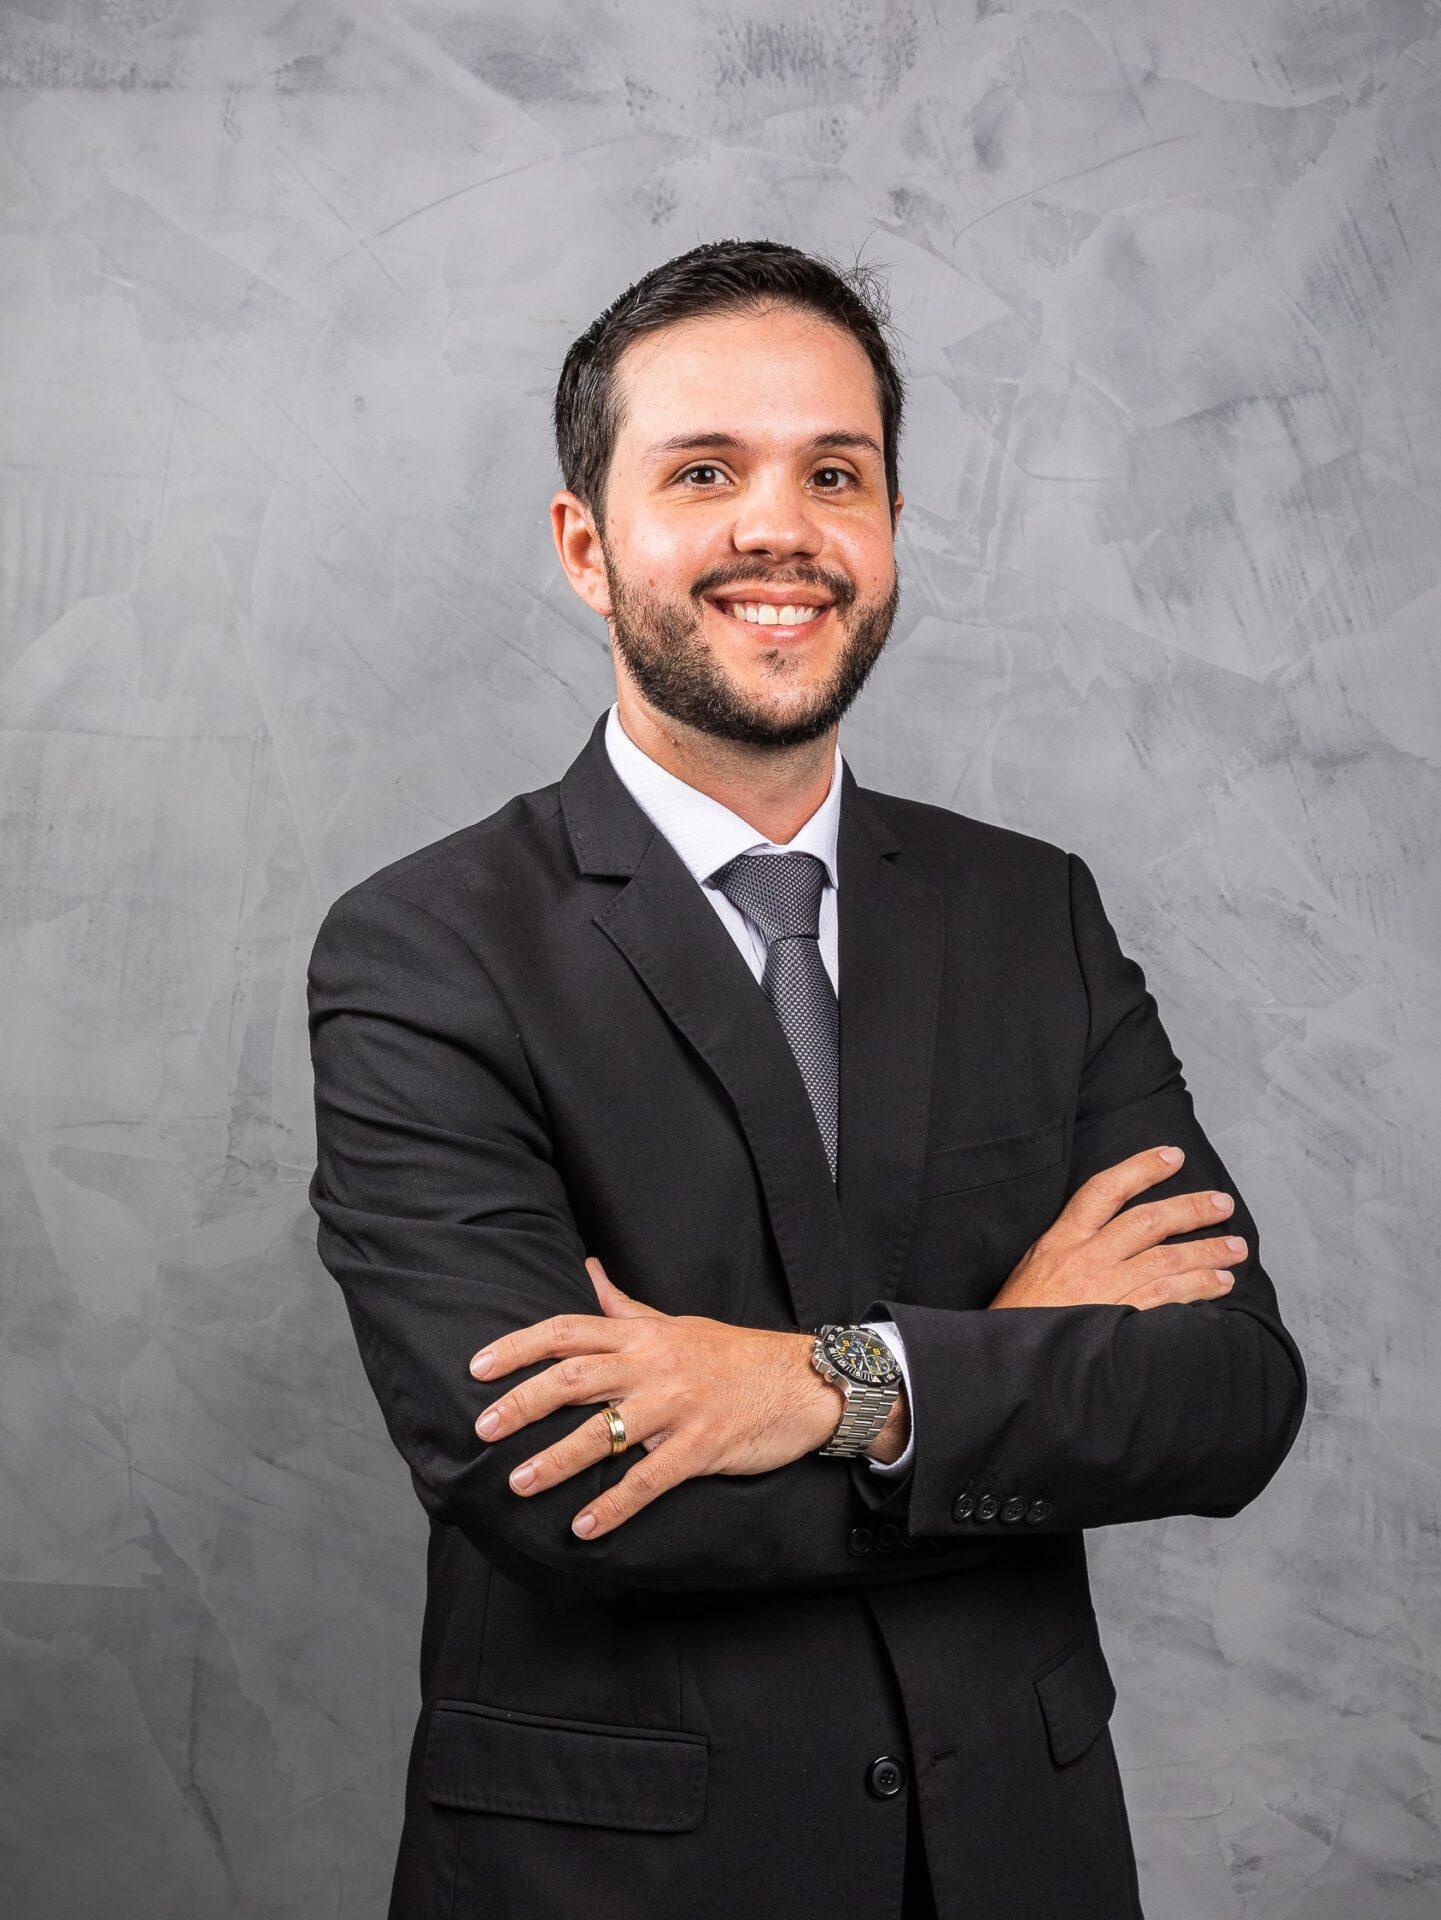 Diego Bastos